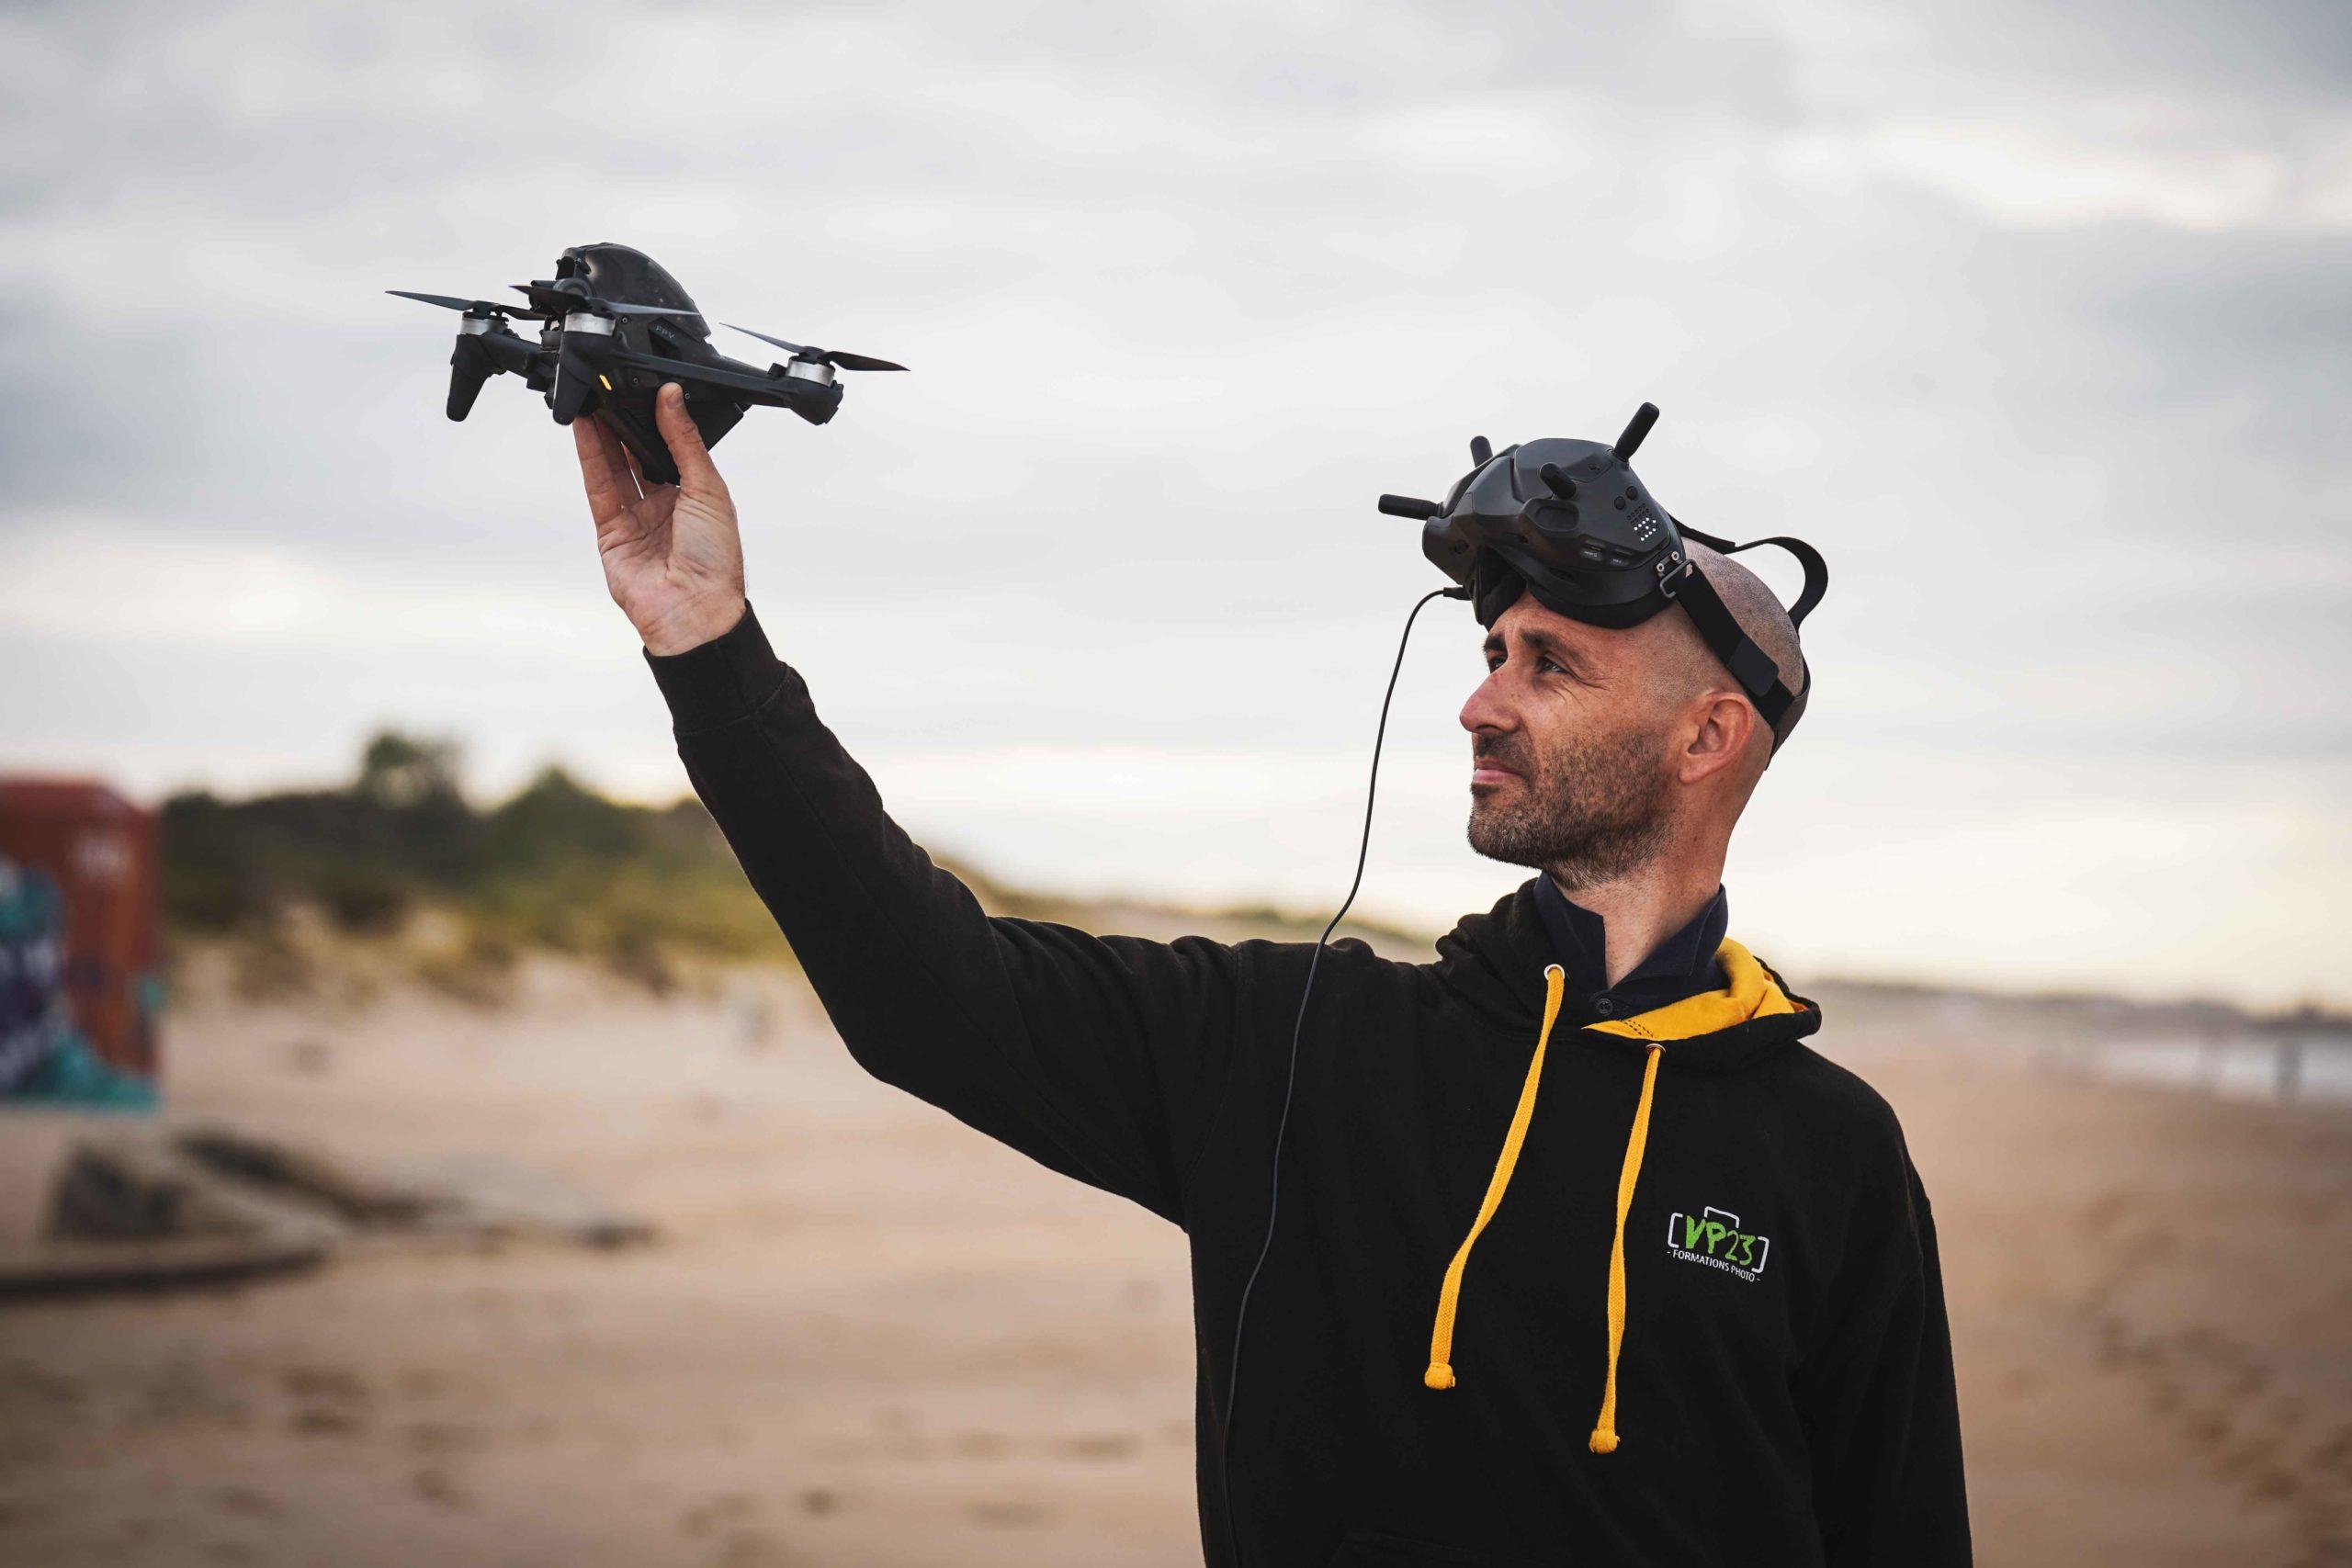 Mickael Bonnami Photographe - Télépilopte de drone - Dji Fpv Combo - Brool Video